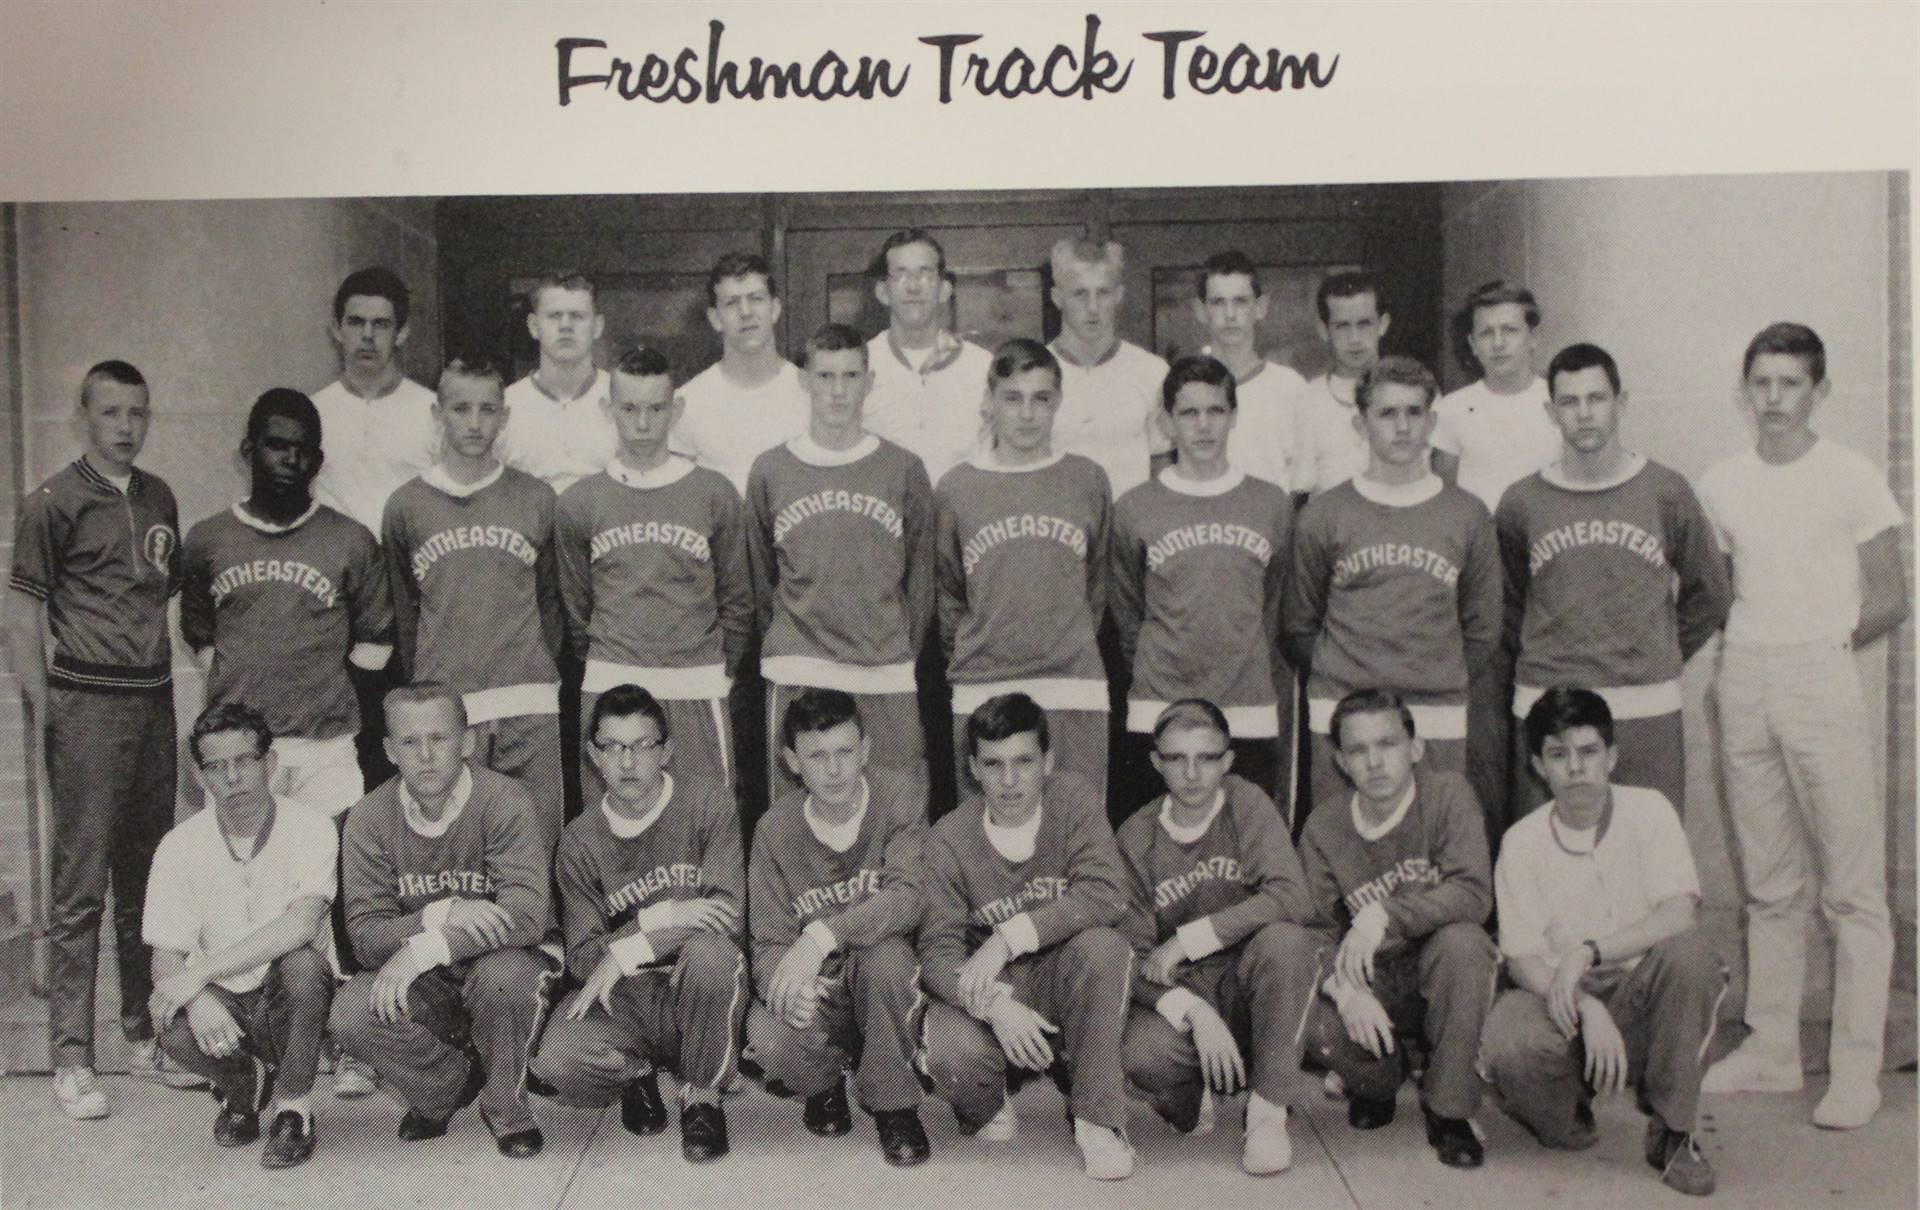 1964 Freshman Track Team